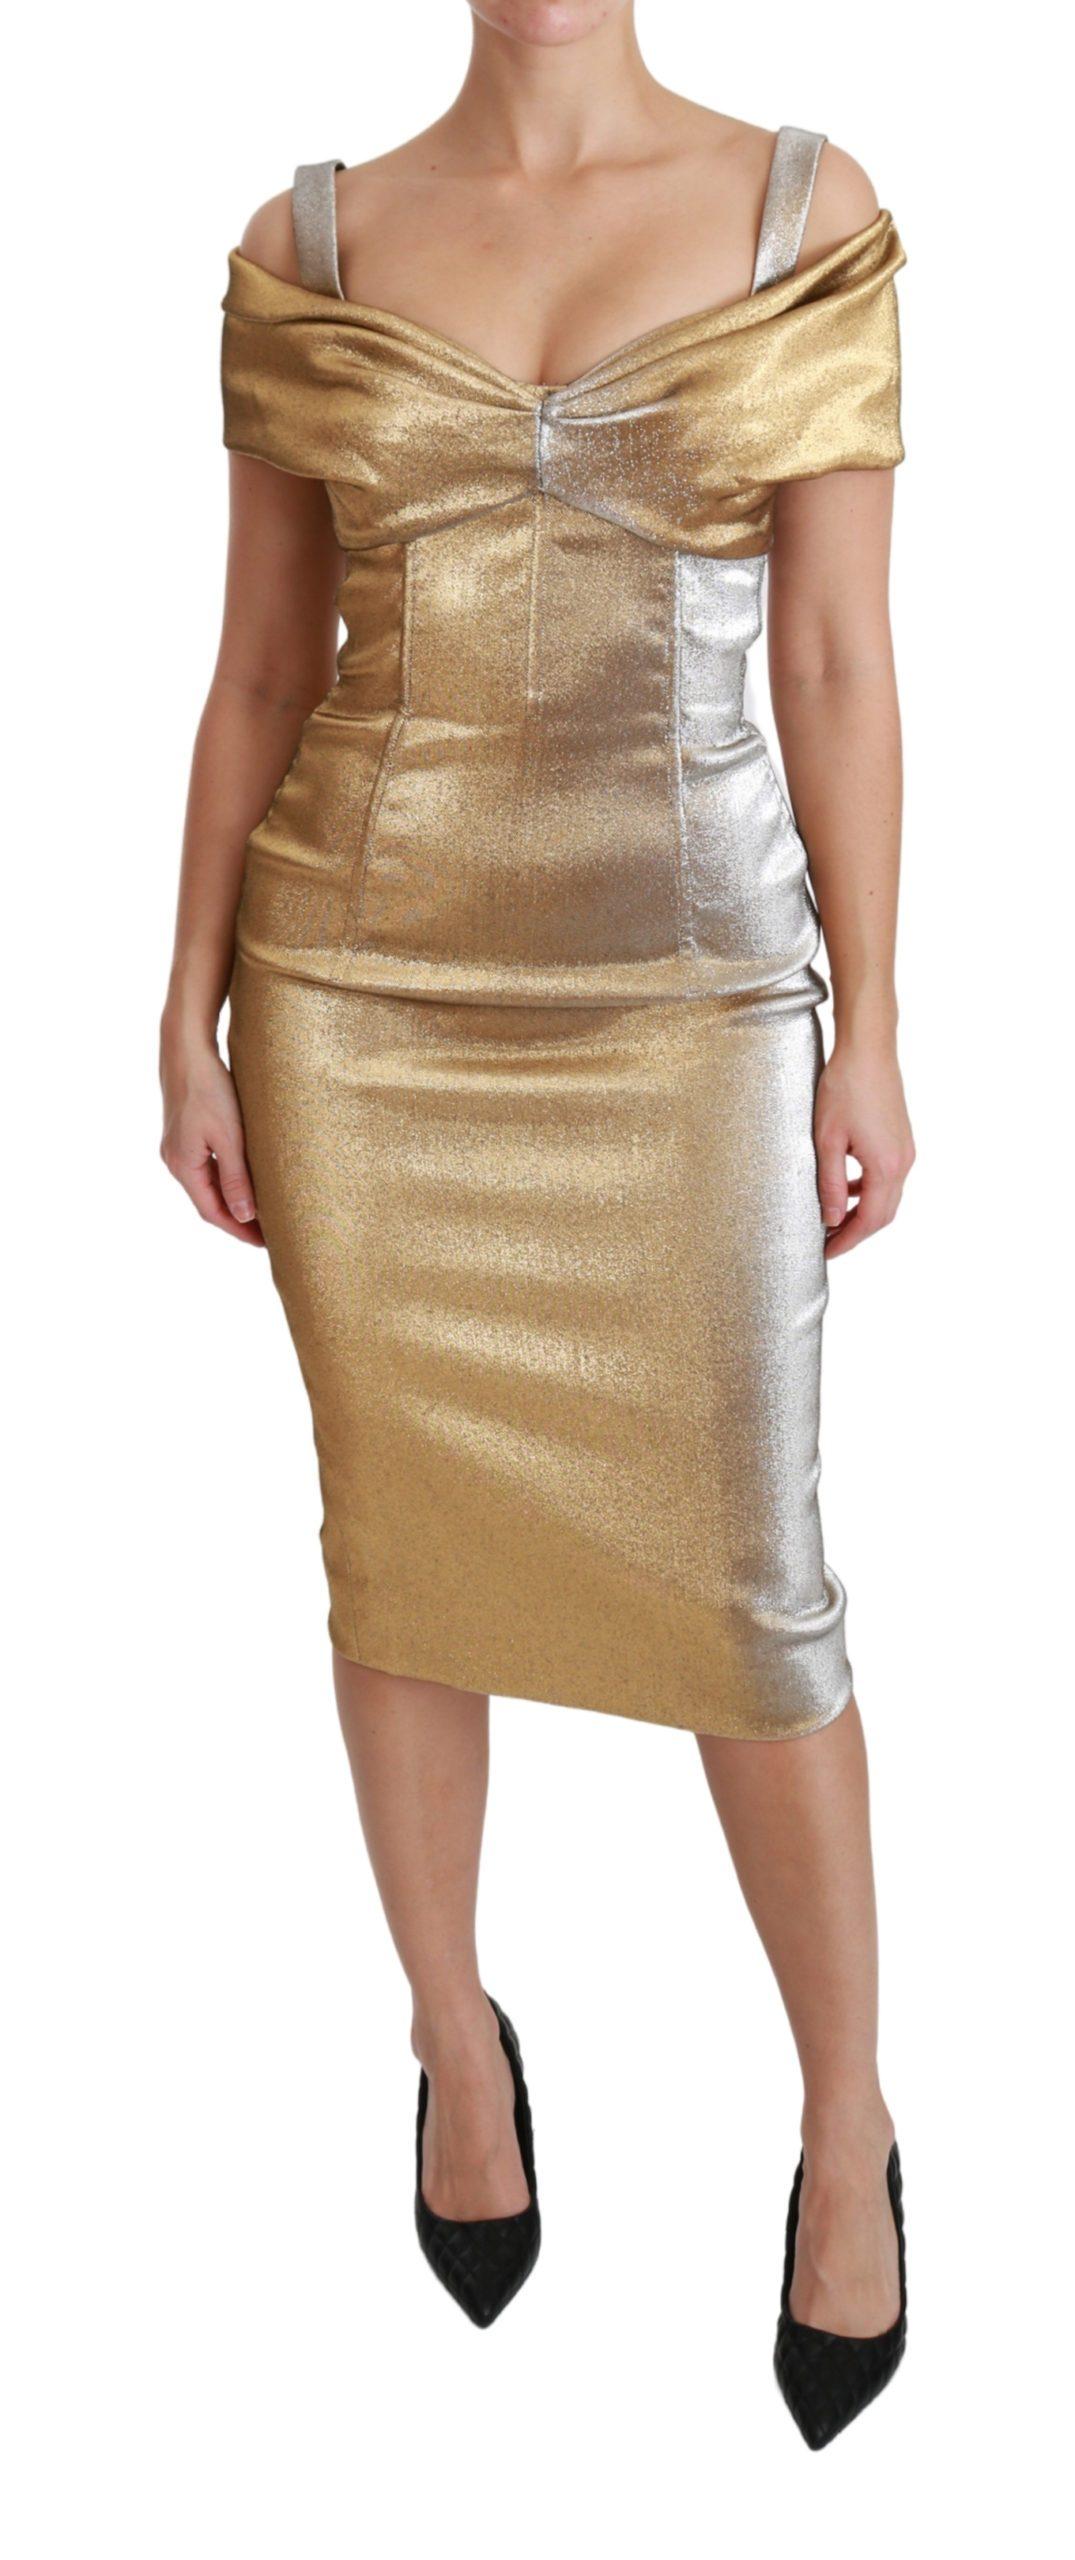 Dolce & Gabbana Women's Sheath Midi Dress Gold DR2523 - IT40|S